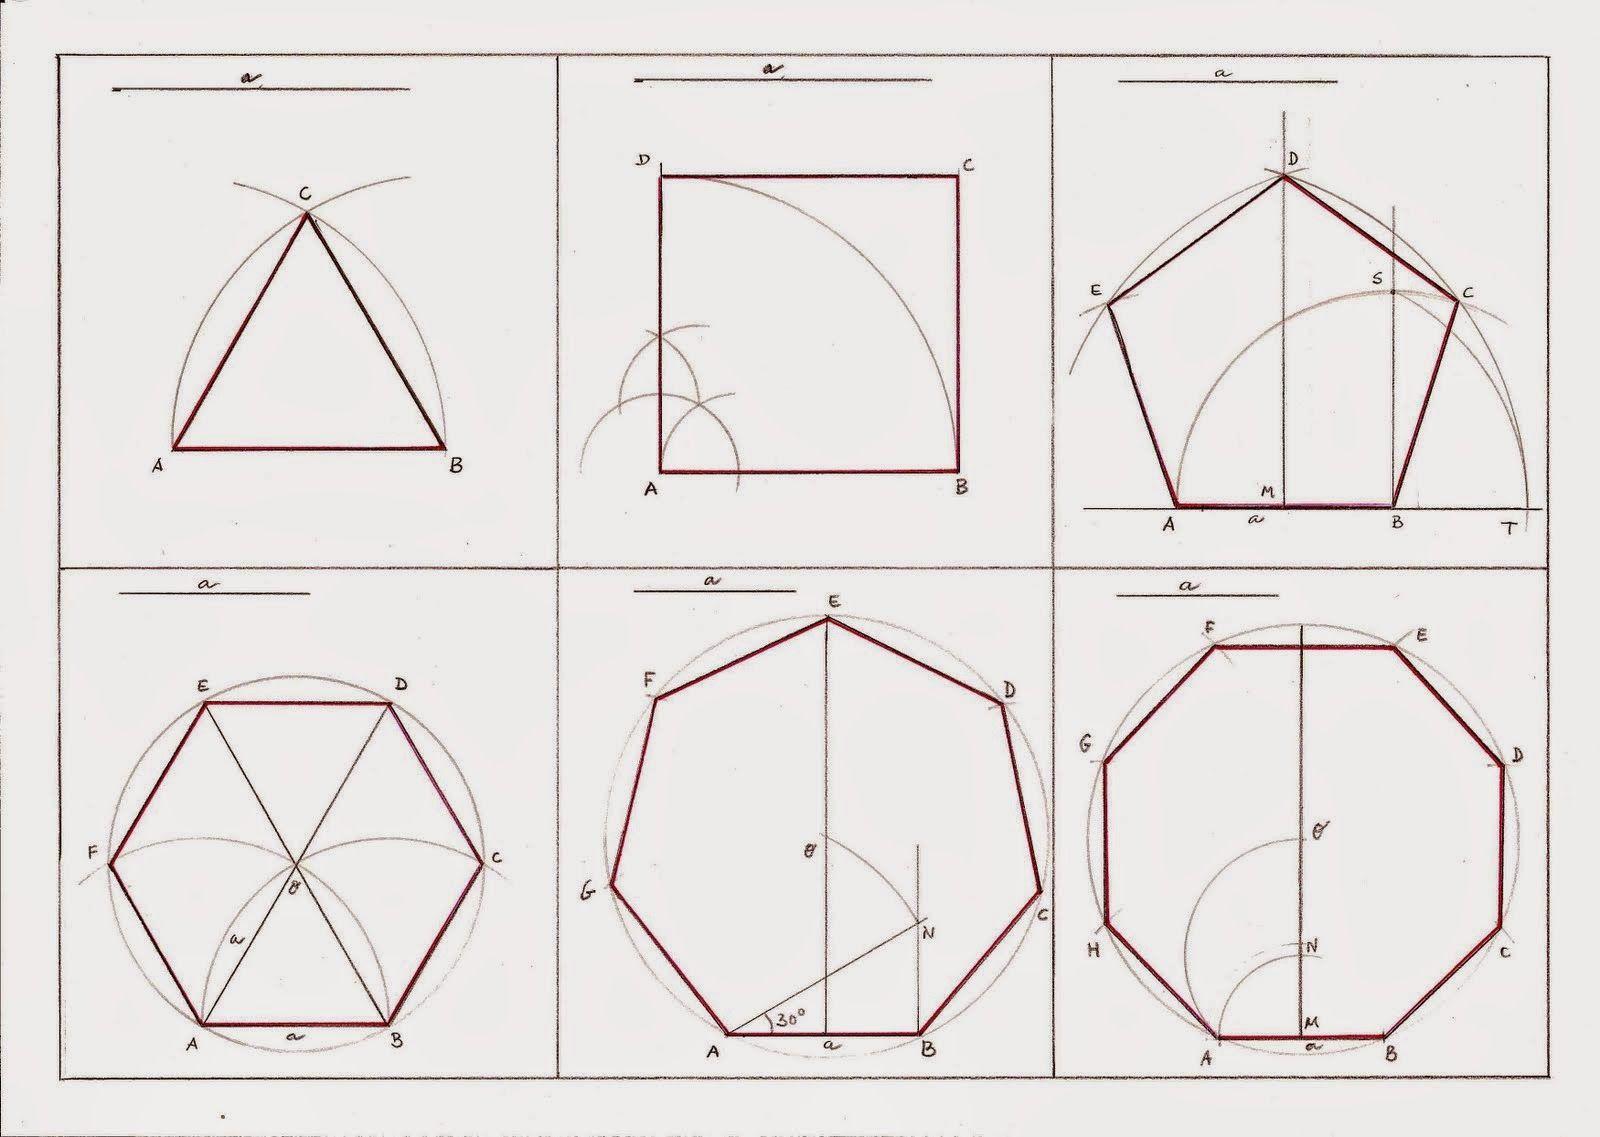 Pintar Crear Pensar Polígonos Regulares Dibujos De Geometria Arte De Geometría Polígono Regular